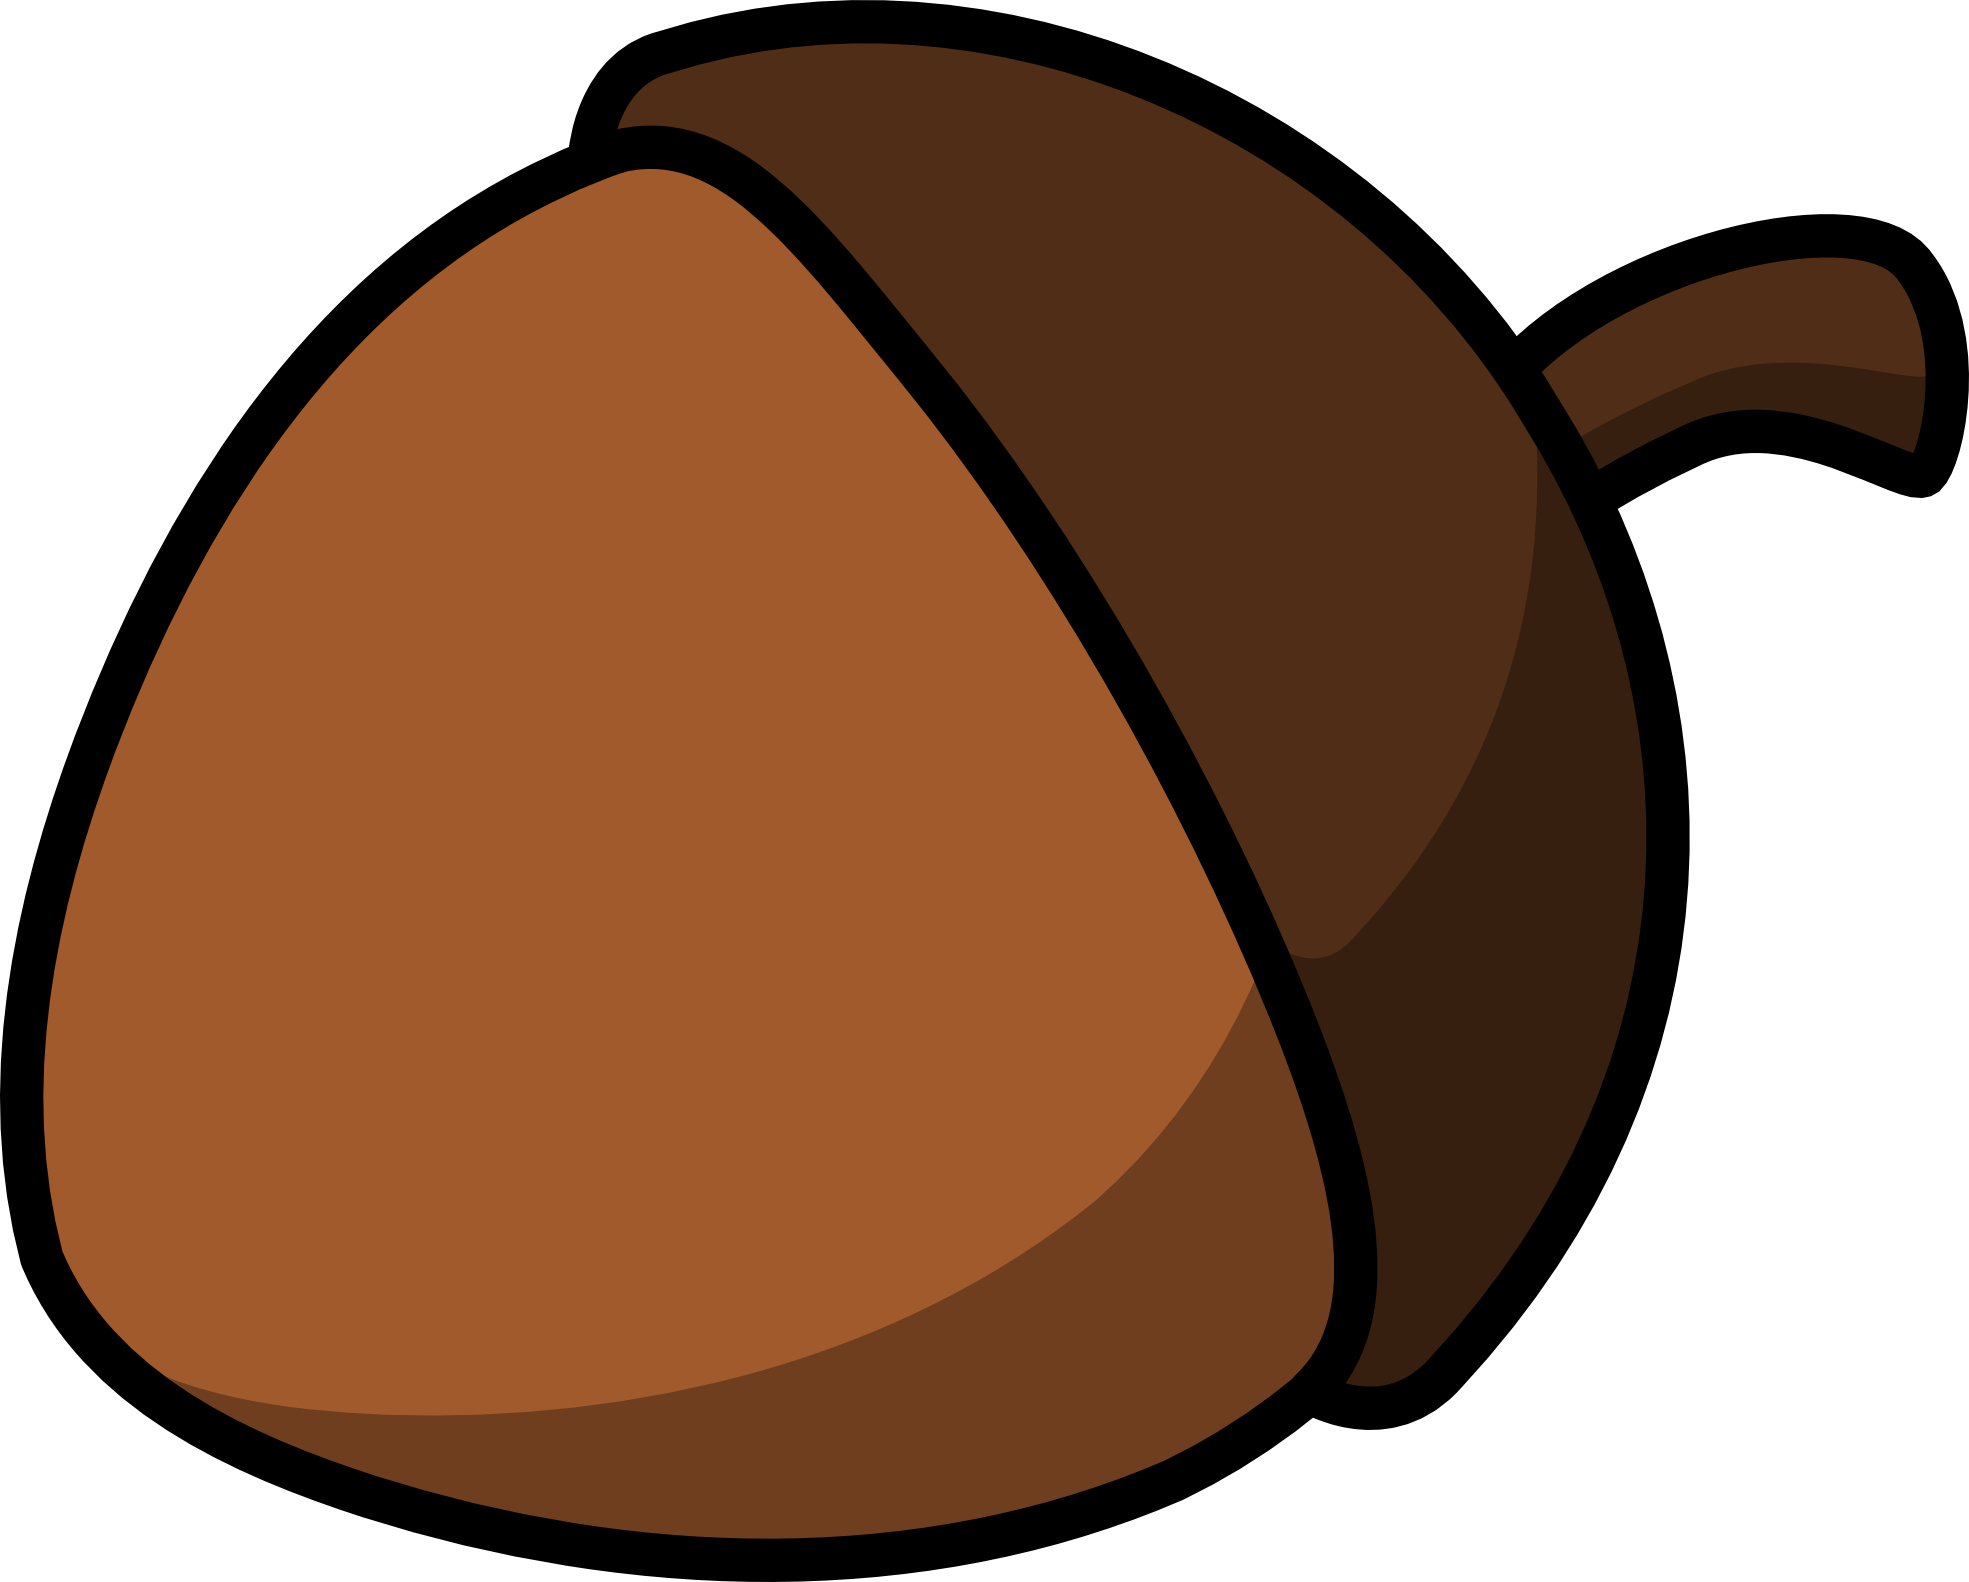 Acorn Clipart-Acorn Clipart-0